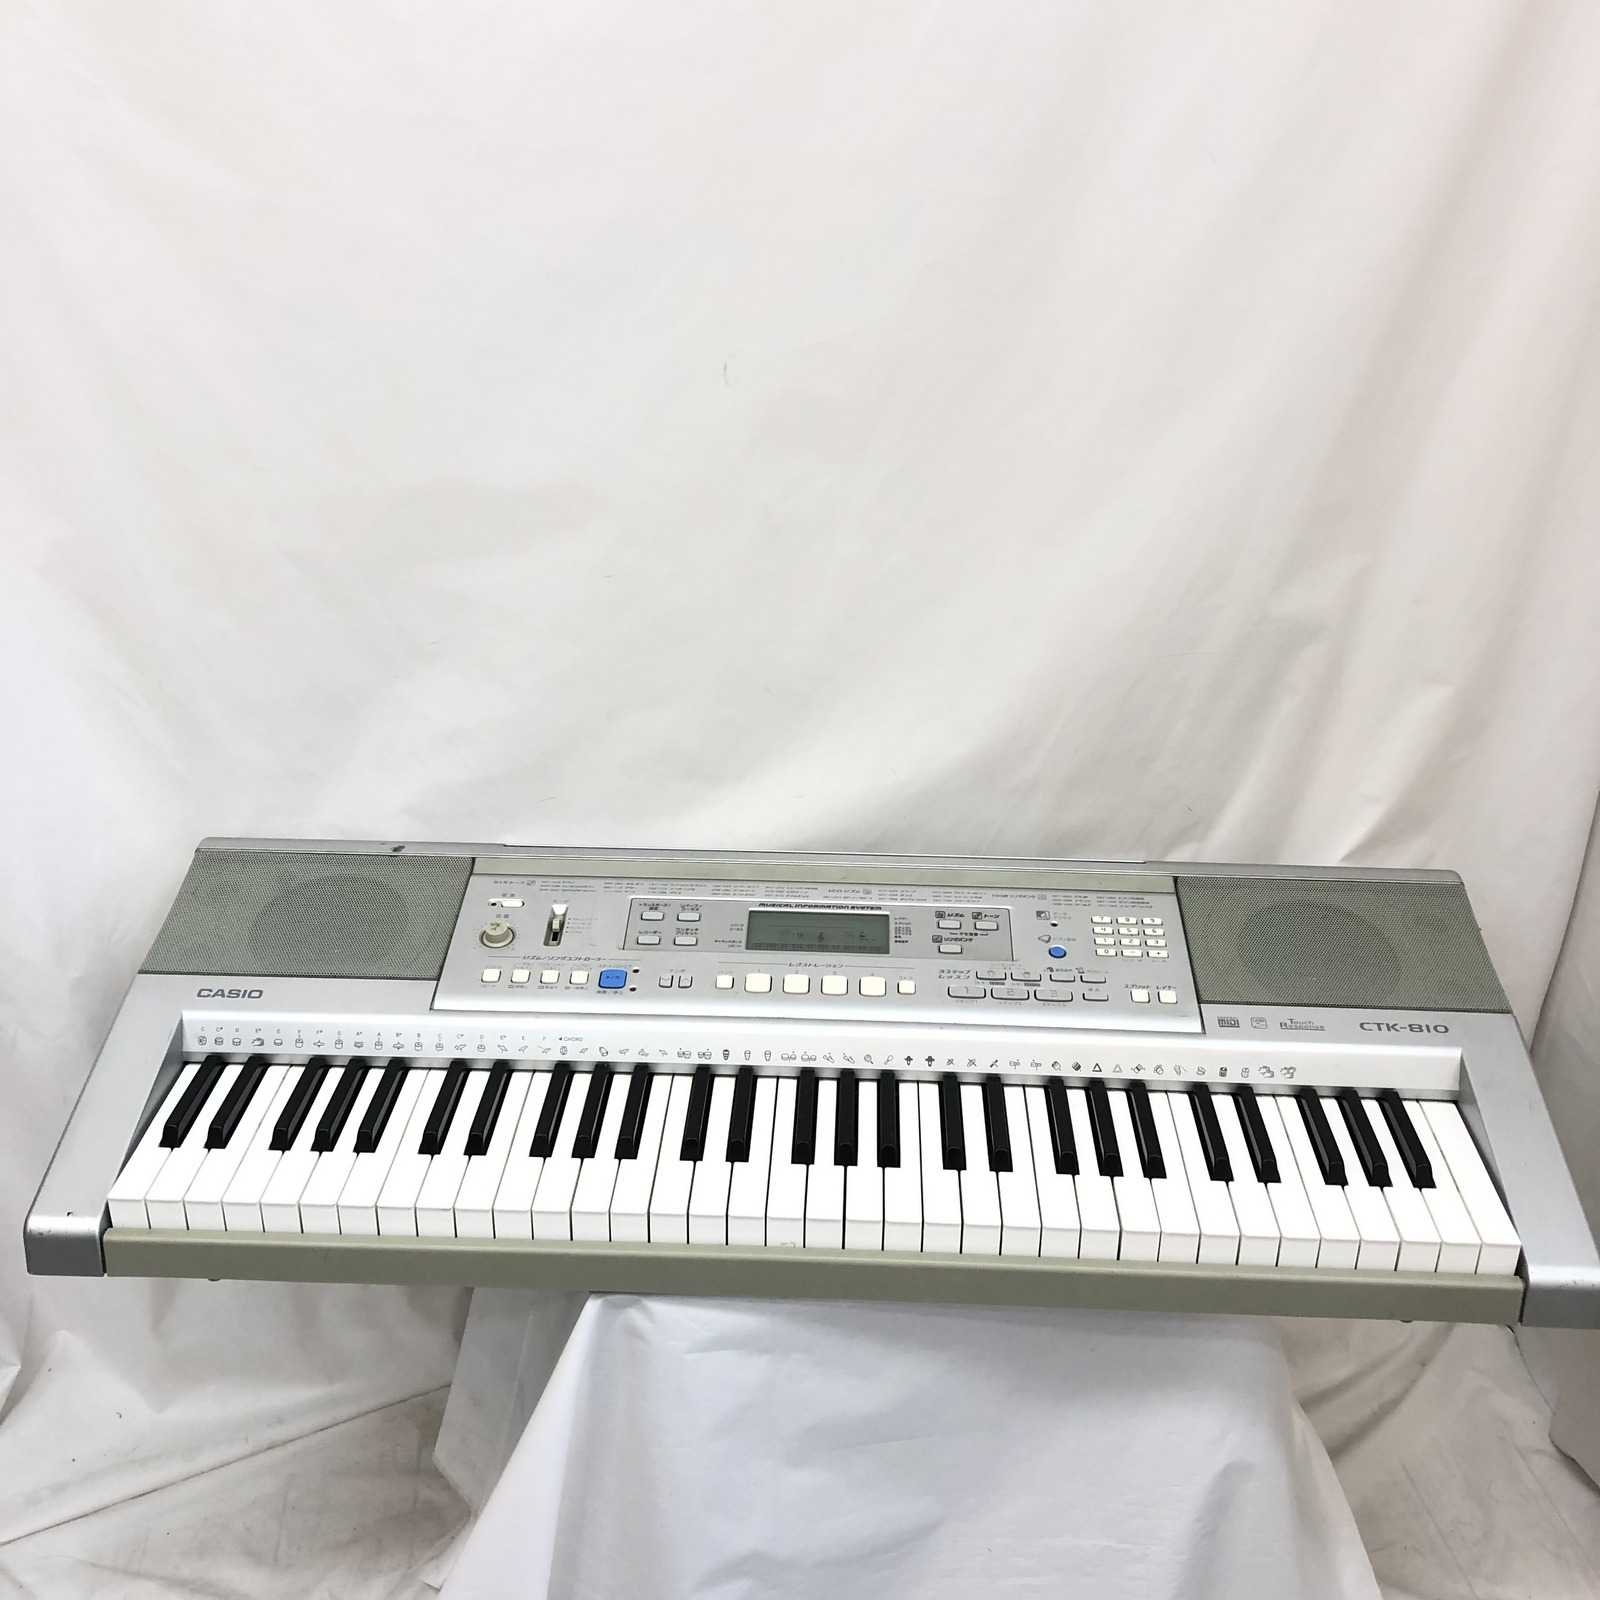 CASIO カシオ 電子キーボード CTK-810 61鍵盤 毎日激安特売で 営業中です ベーシックタイプ 中古 卸直営 鍵盤楽器 シルバー アダプター付き 電子ピアノ T東大阪店